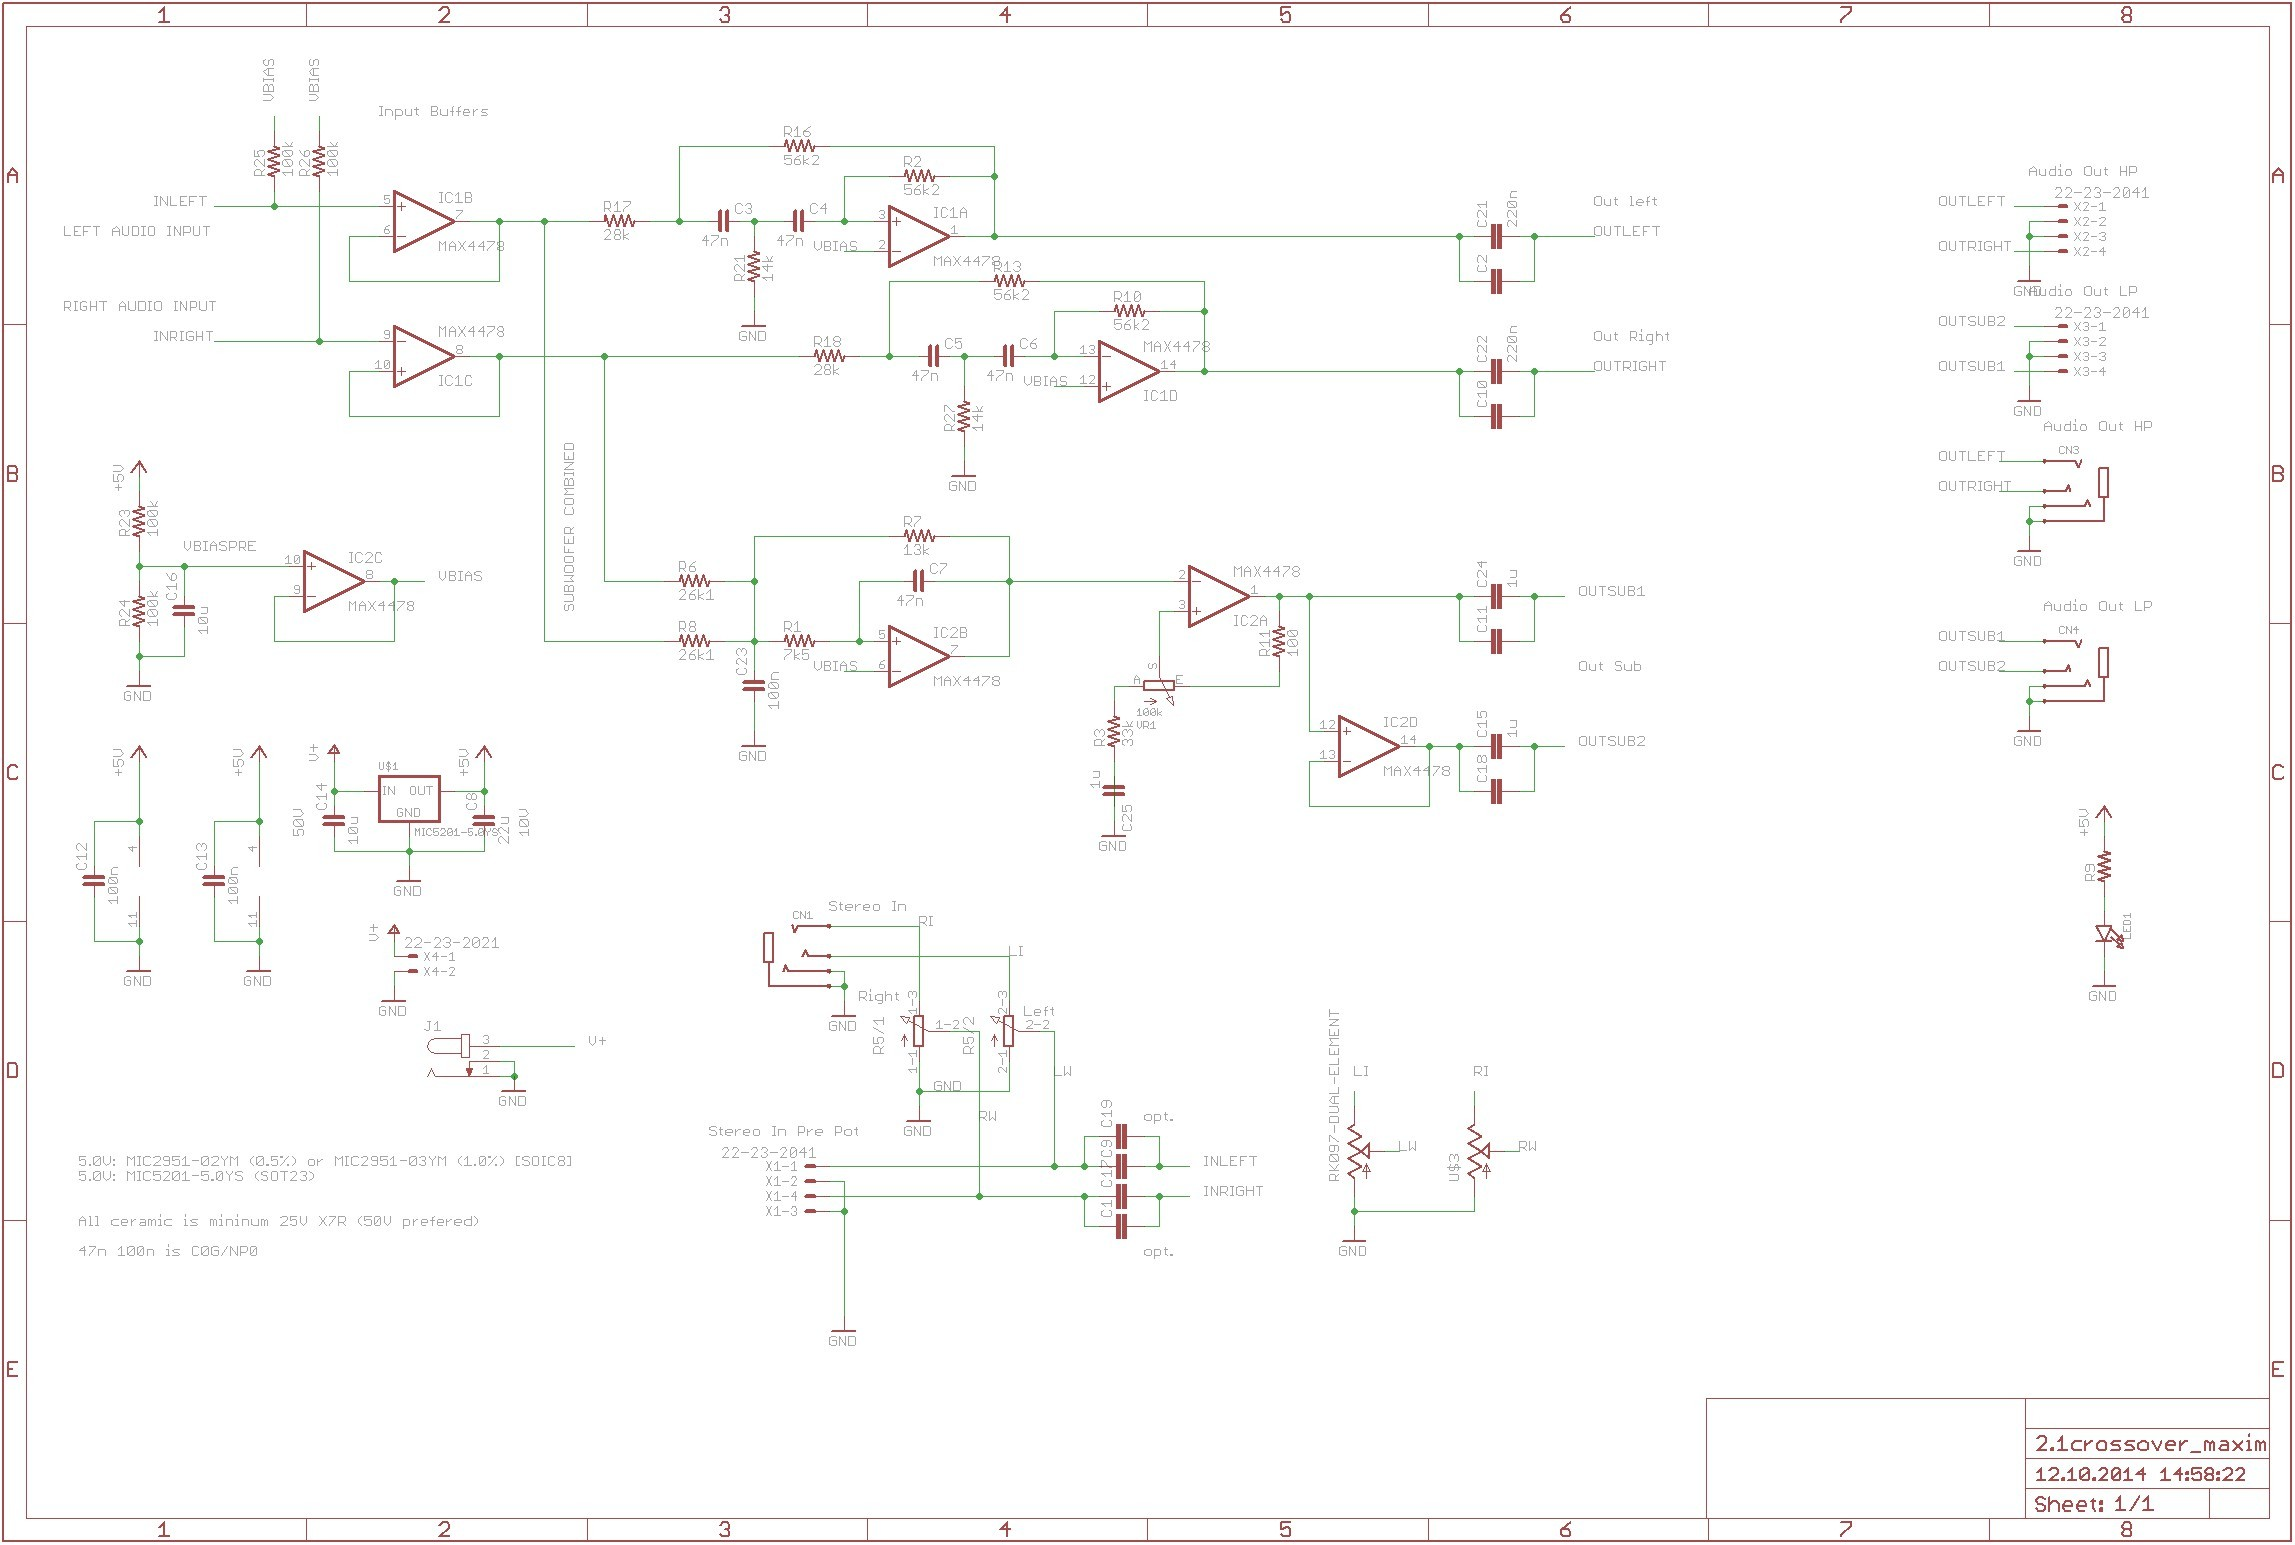 Wire Harness Diagram Fresh Basic Wiring Diagram Diagram Of Wire Harness Diagram